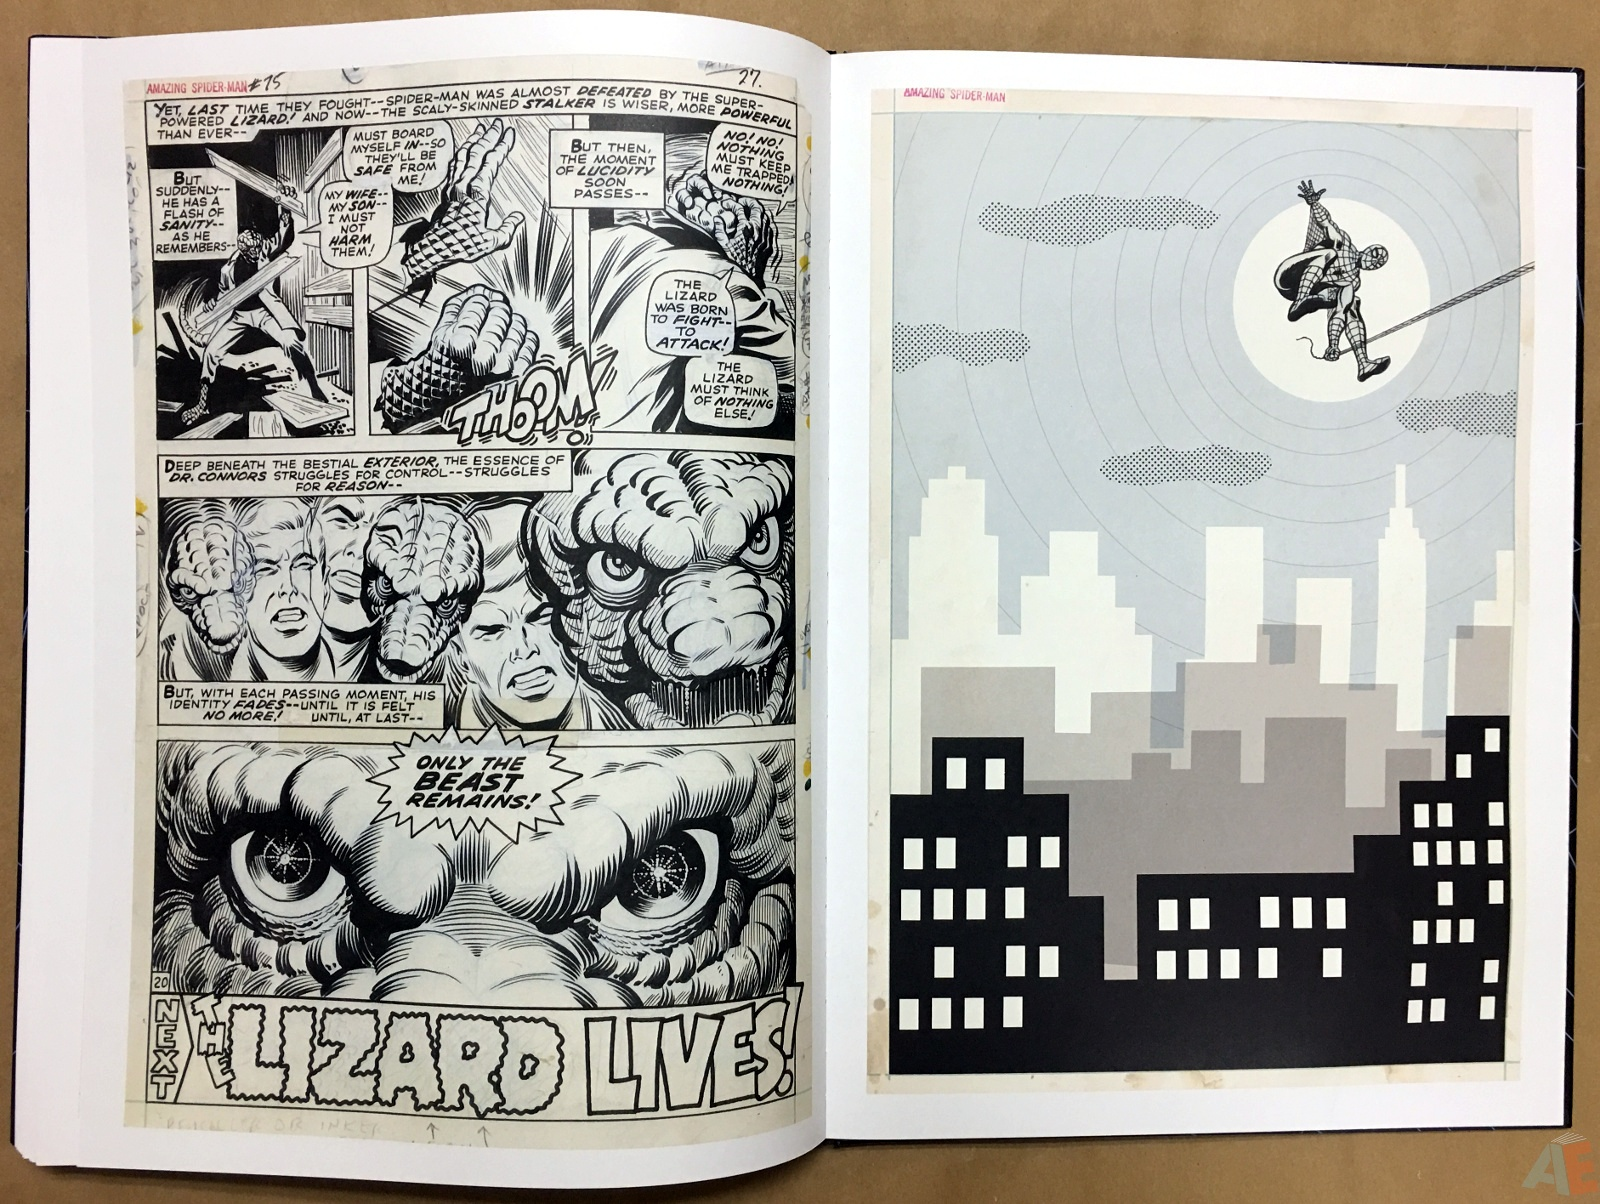 John Romita's The Amazing Spider-Man Artist's Edition 44